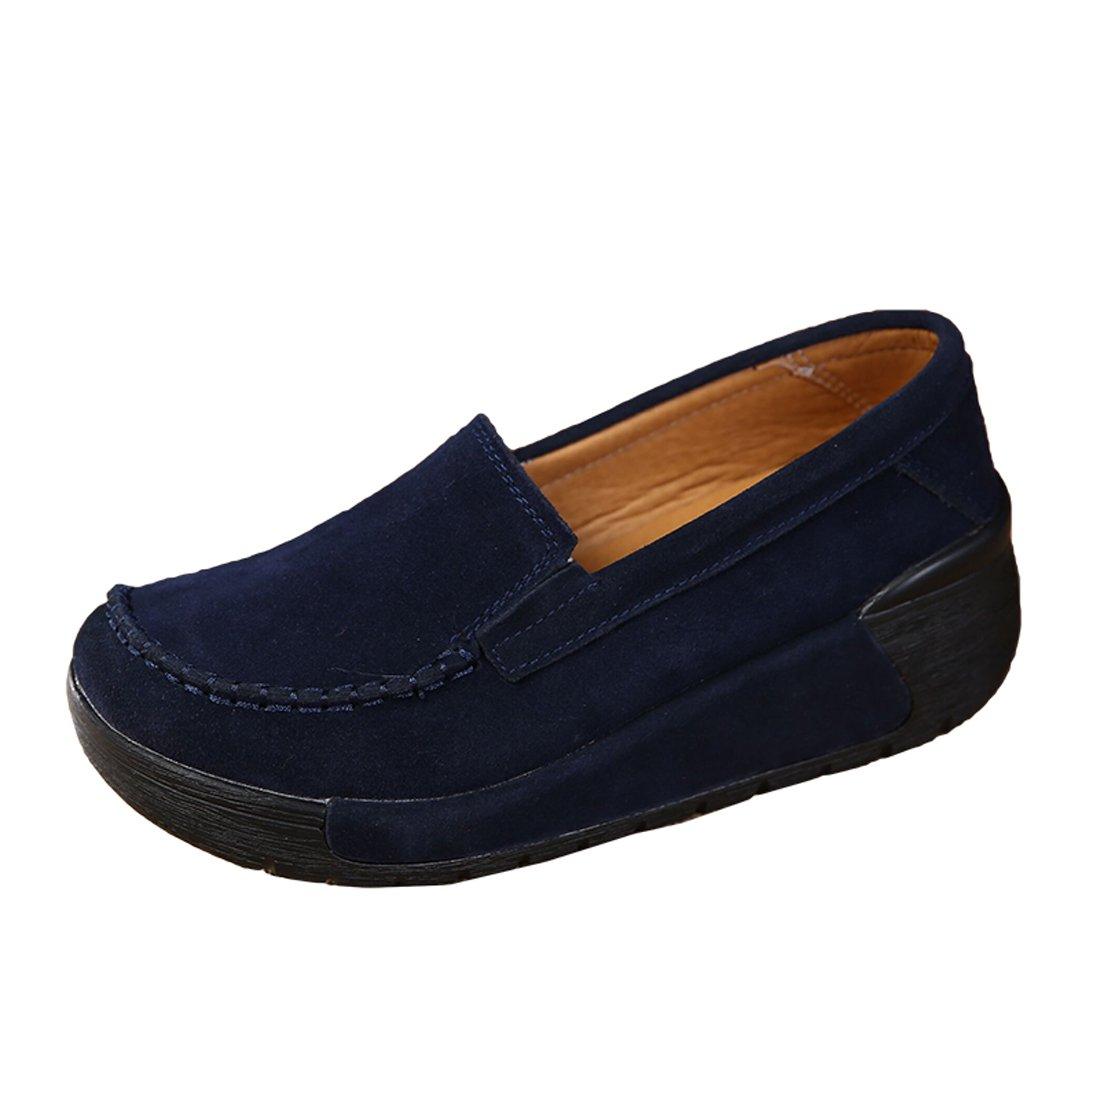 Z.SUO Mocassins Femmes Z.SUO Suède Casuel Femmes Confort Chaussures 19993 Loafers Bleu.4 3aab8f1 - reprogrammed.space